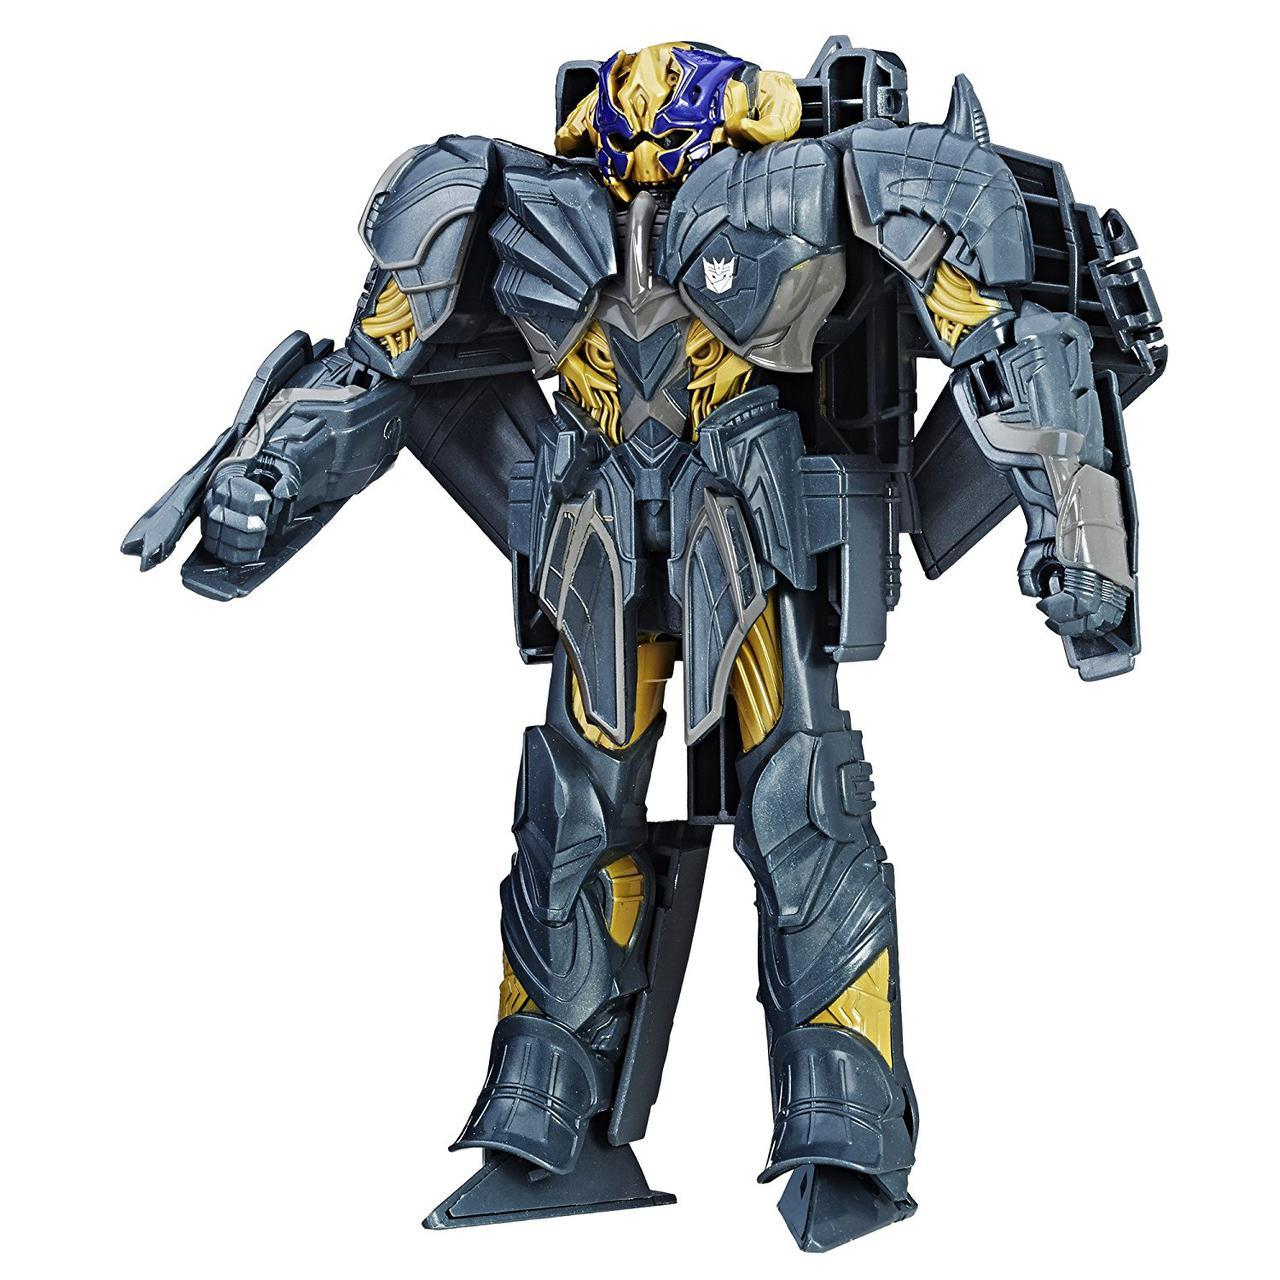 Трансформер Мегатрон 18 см Transformers MV5 Turbo Changer Megatron Action Figure Hasbro C2824